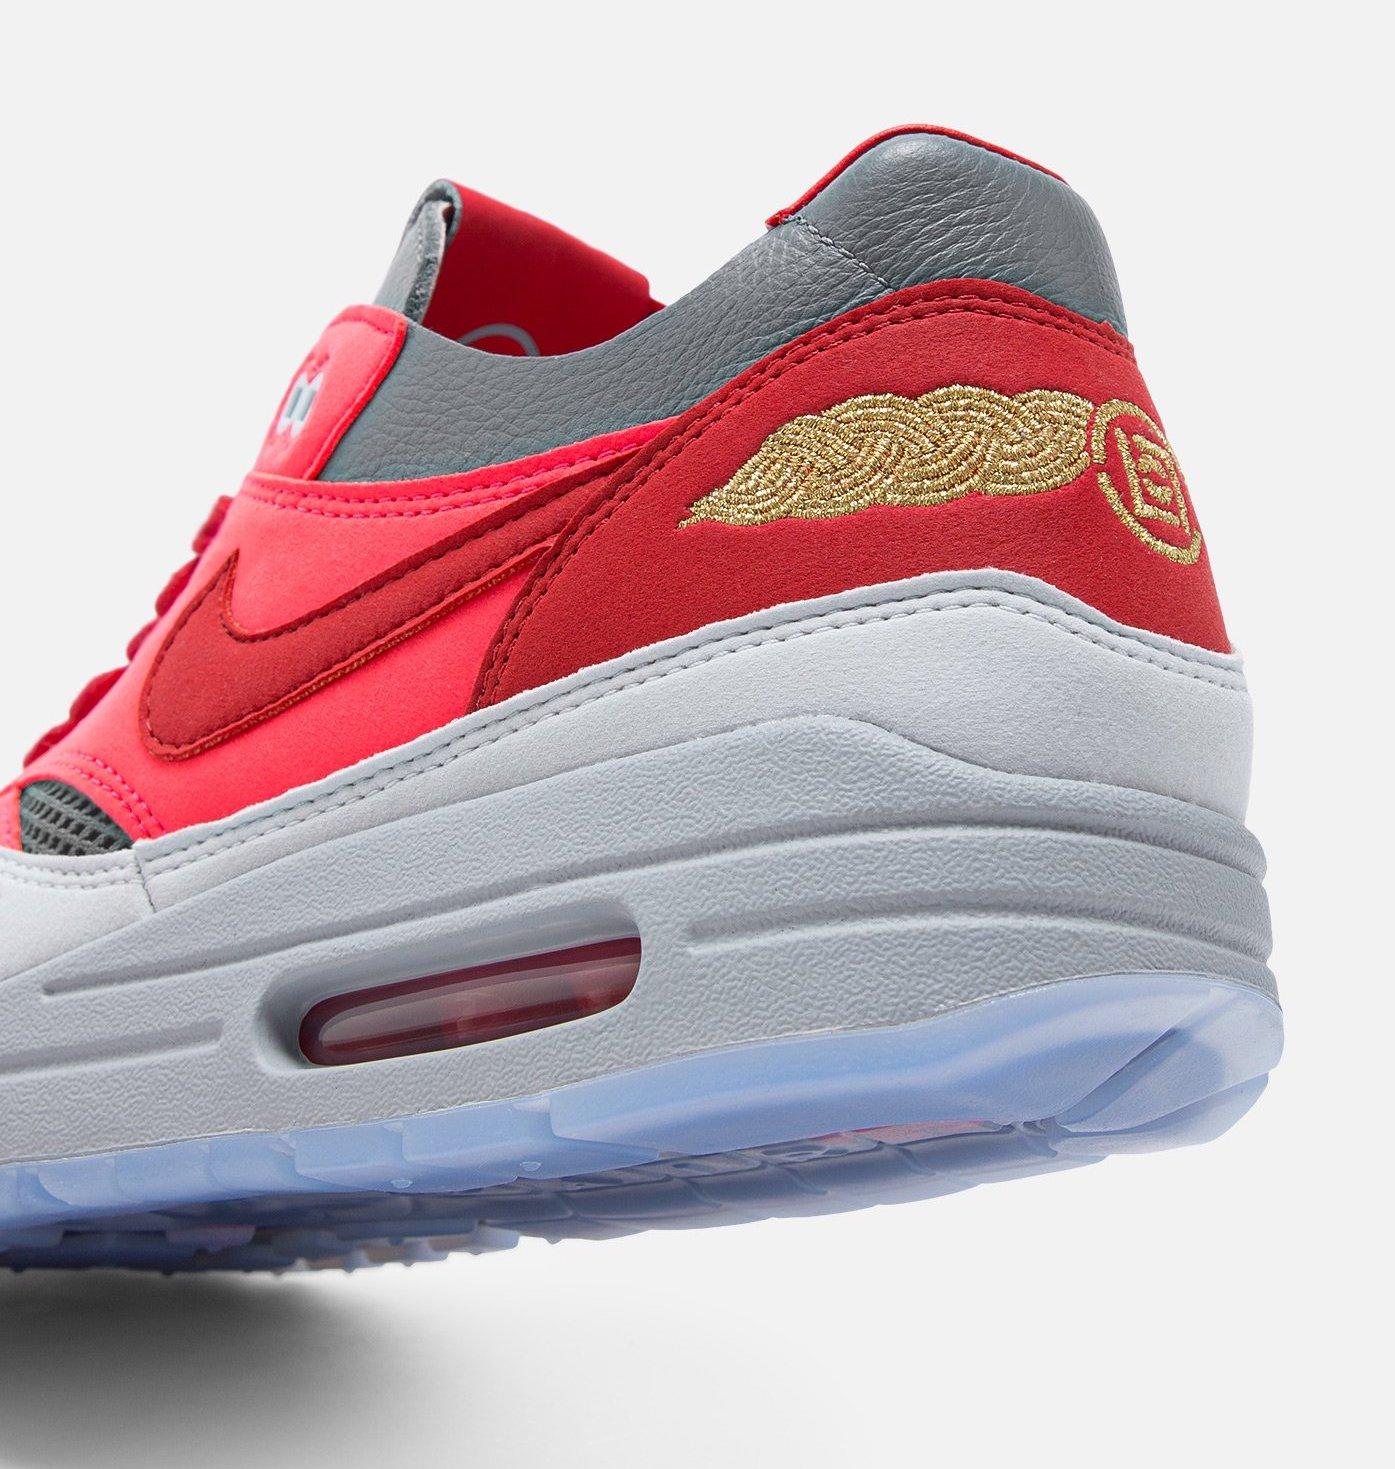 CLOT x Nike Air Max 1 K.O.D. Solar Red DD1870-600 Release Date